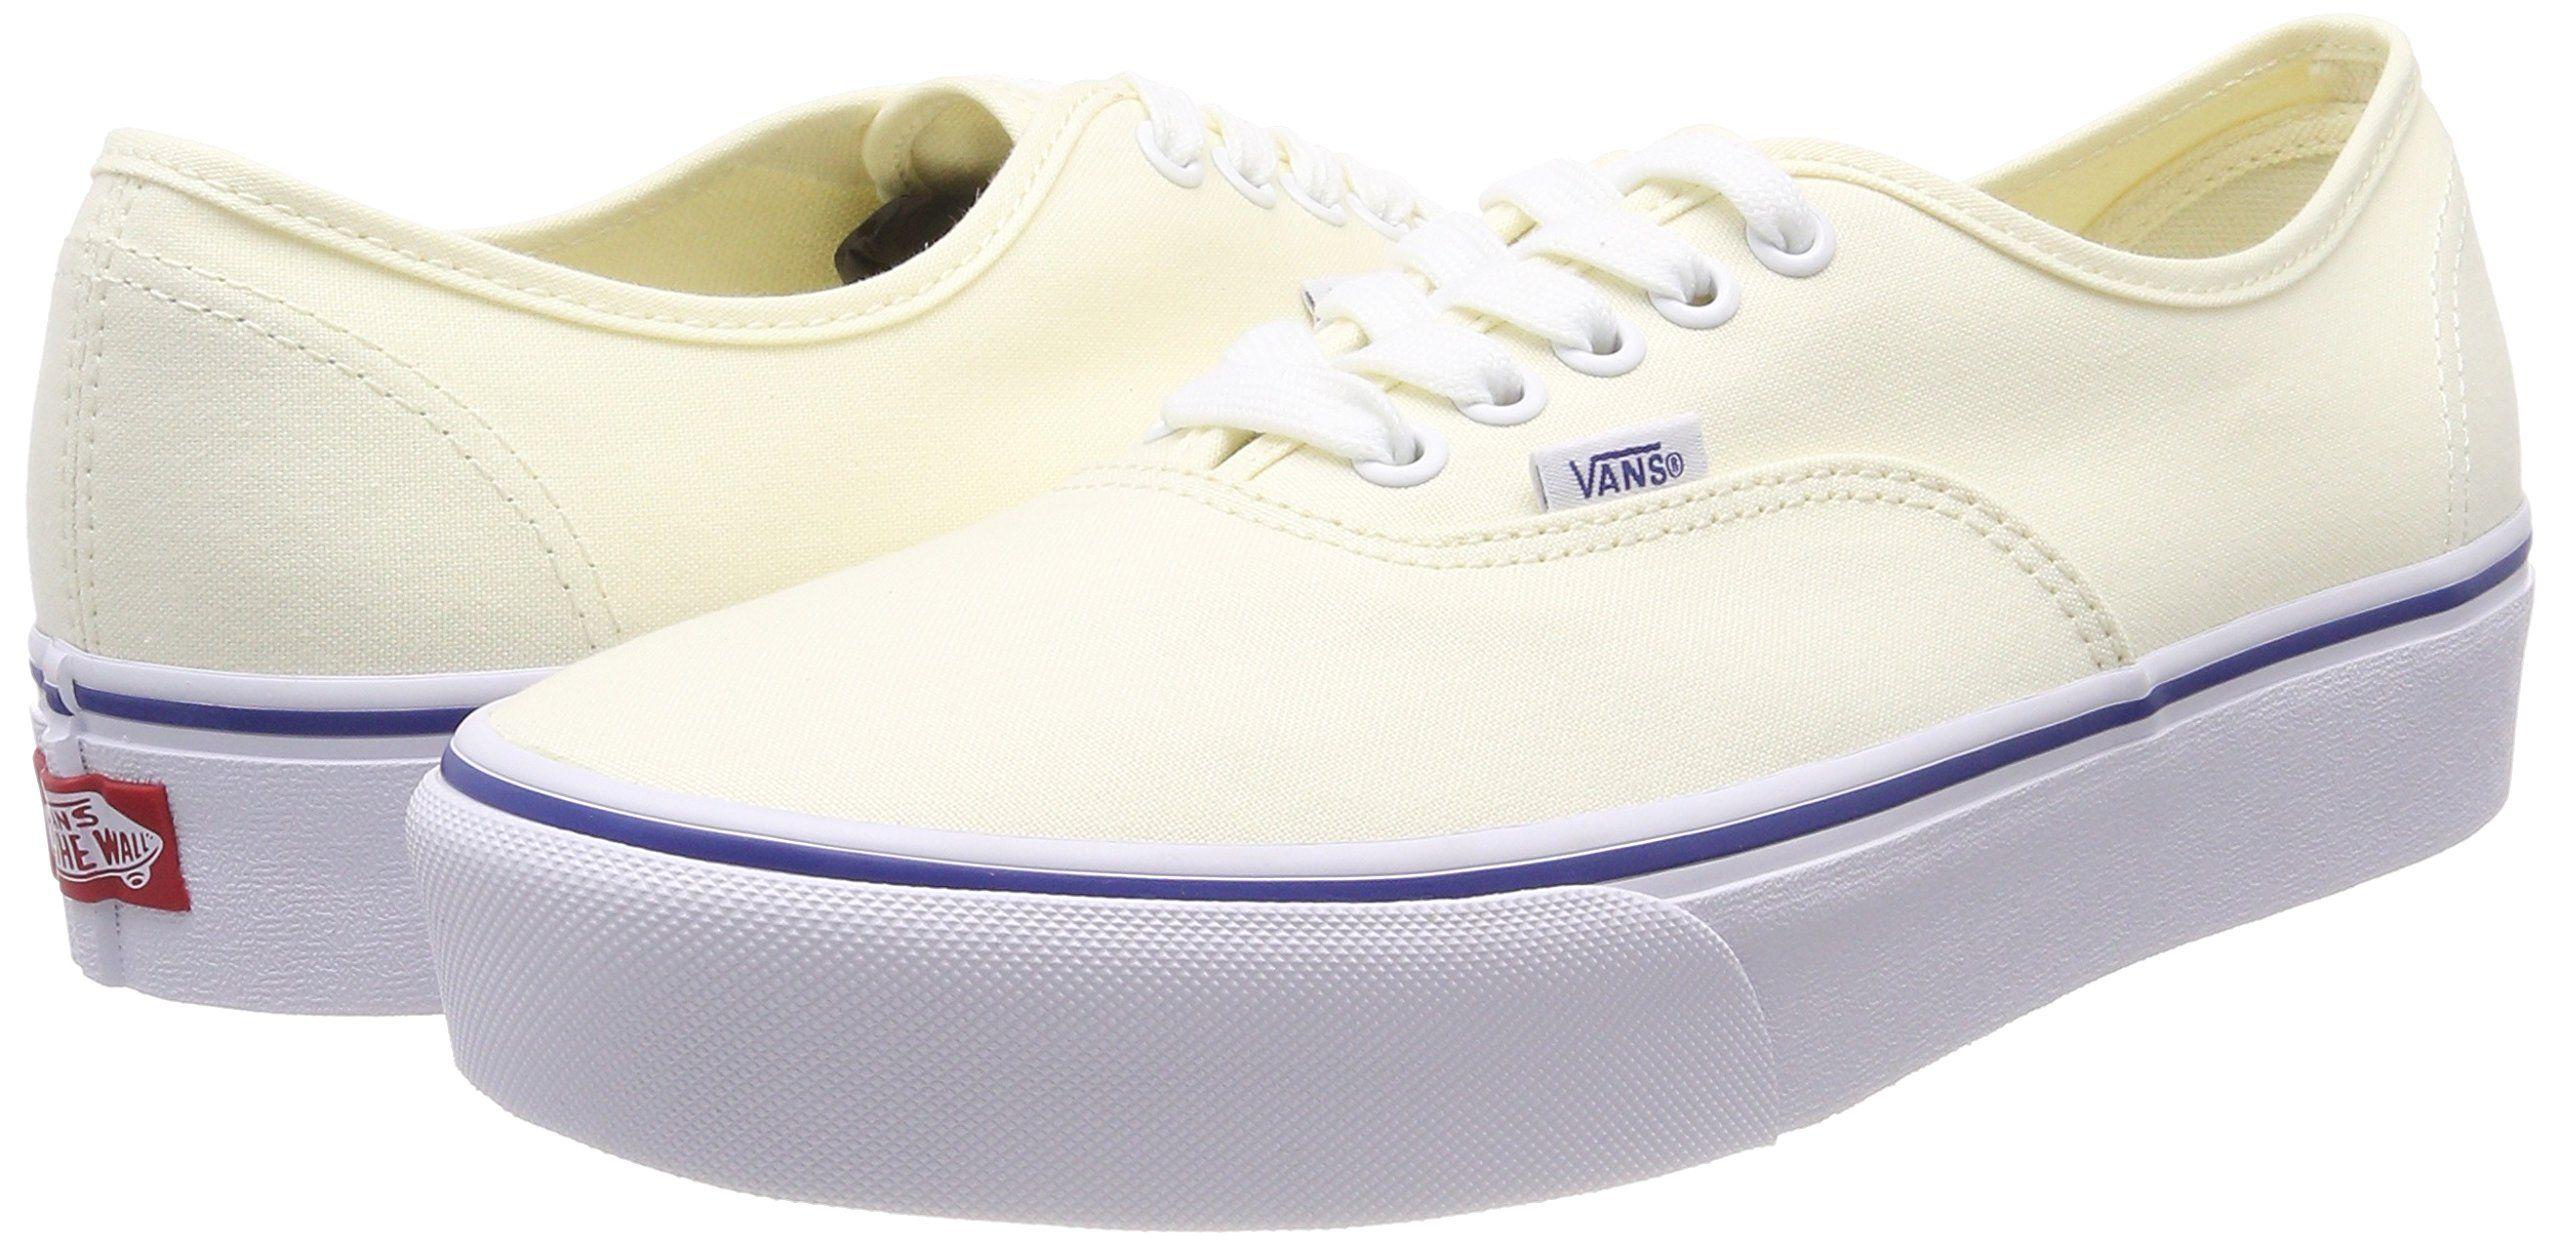 Vans Authentic Platform Canvas Classic White/True White 7 ...